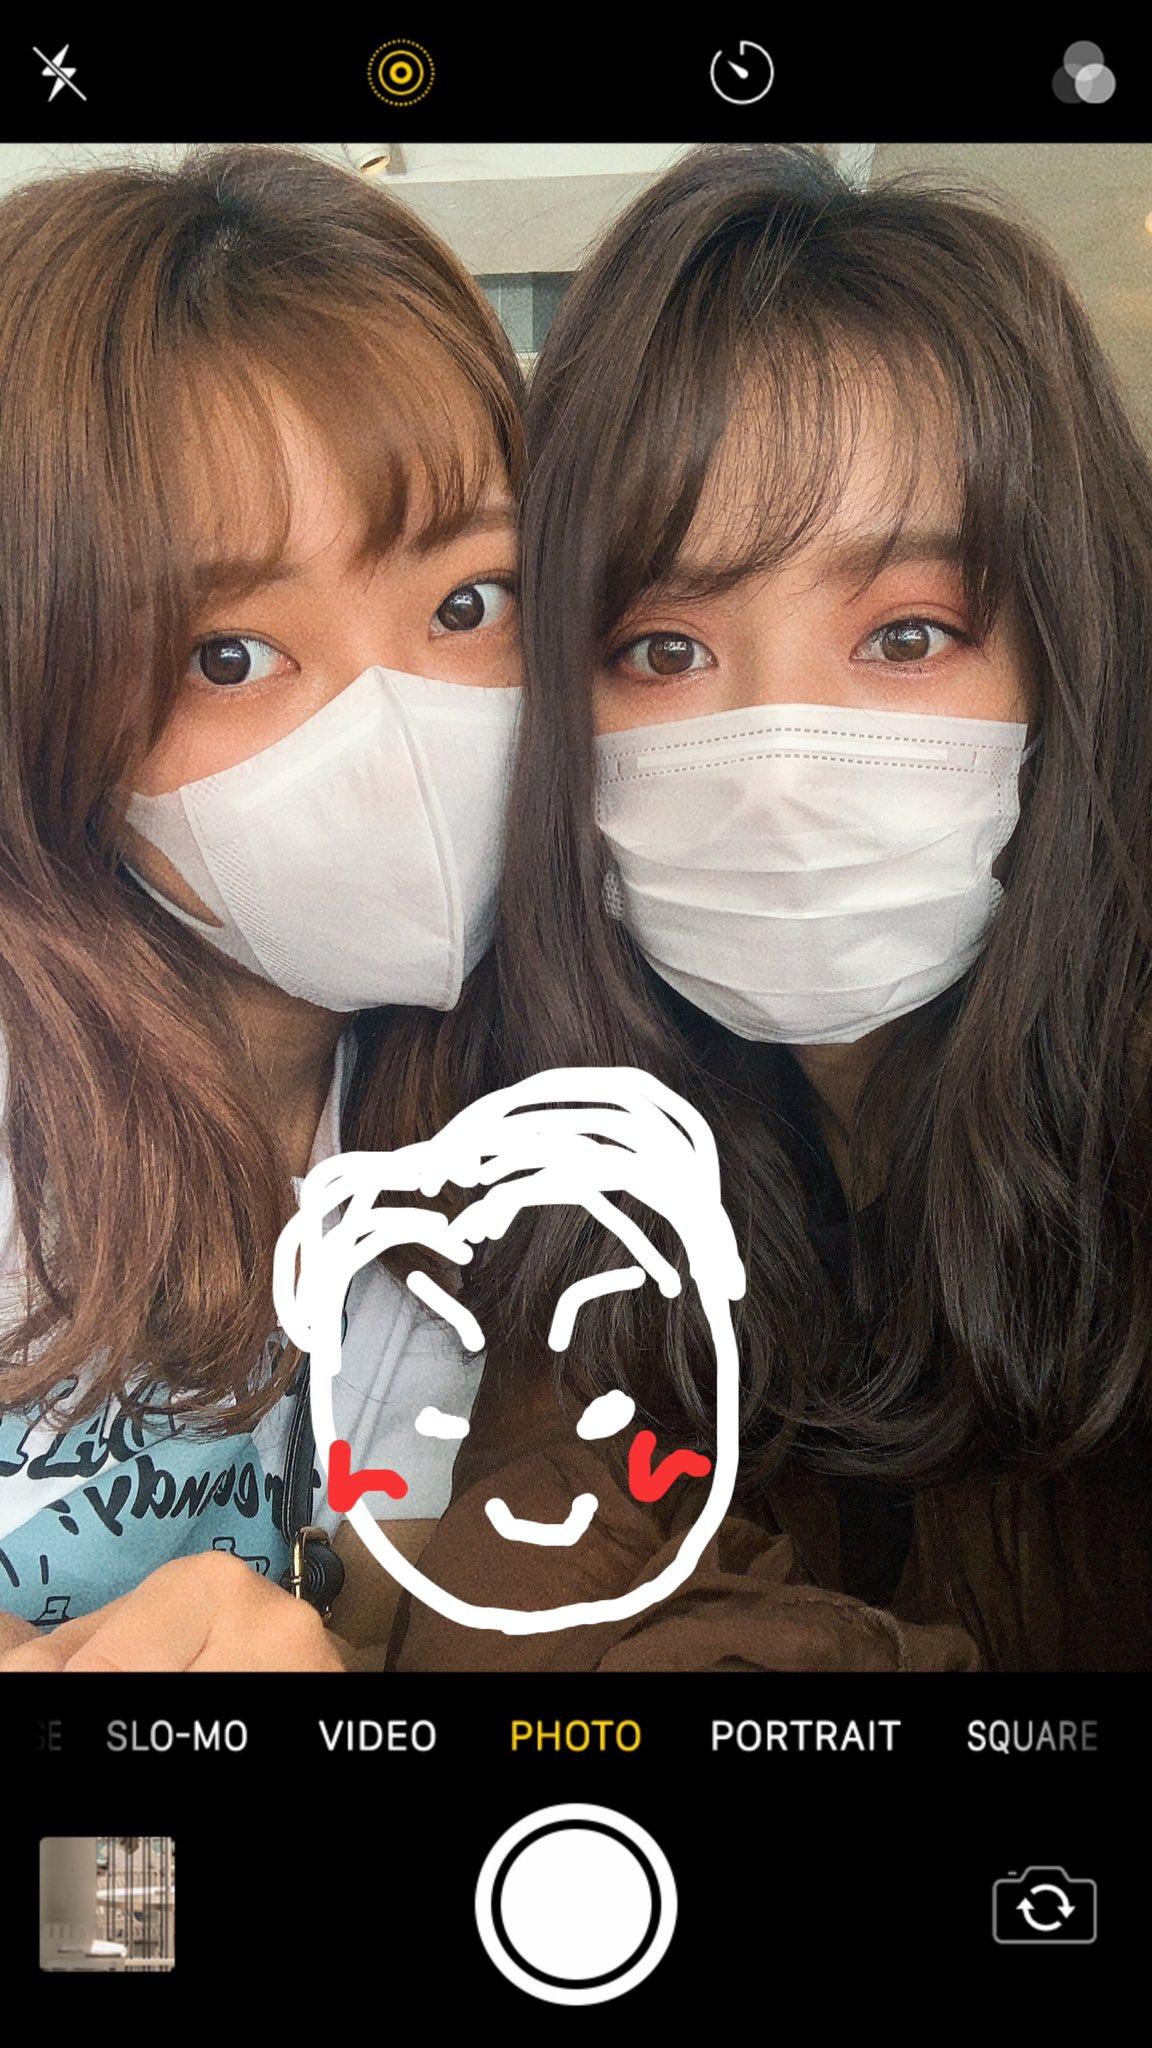 AKB48タイムズ(AKB48まとめ) : 山田菜々 - livedoor Blog(ブログ)